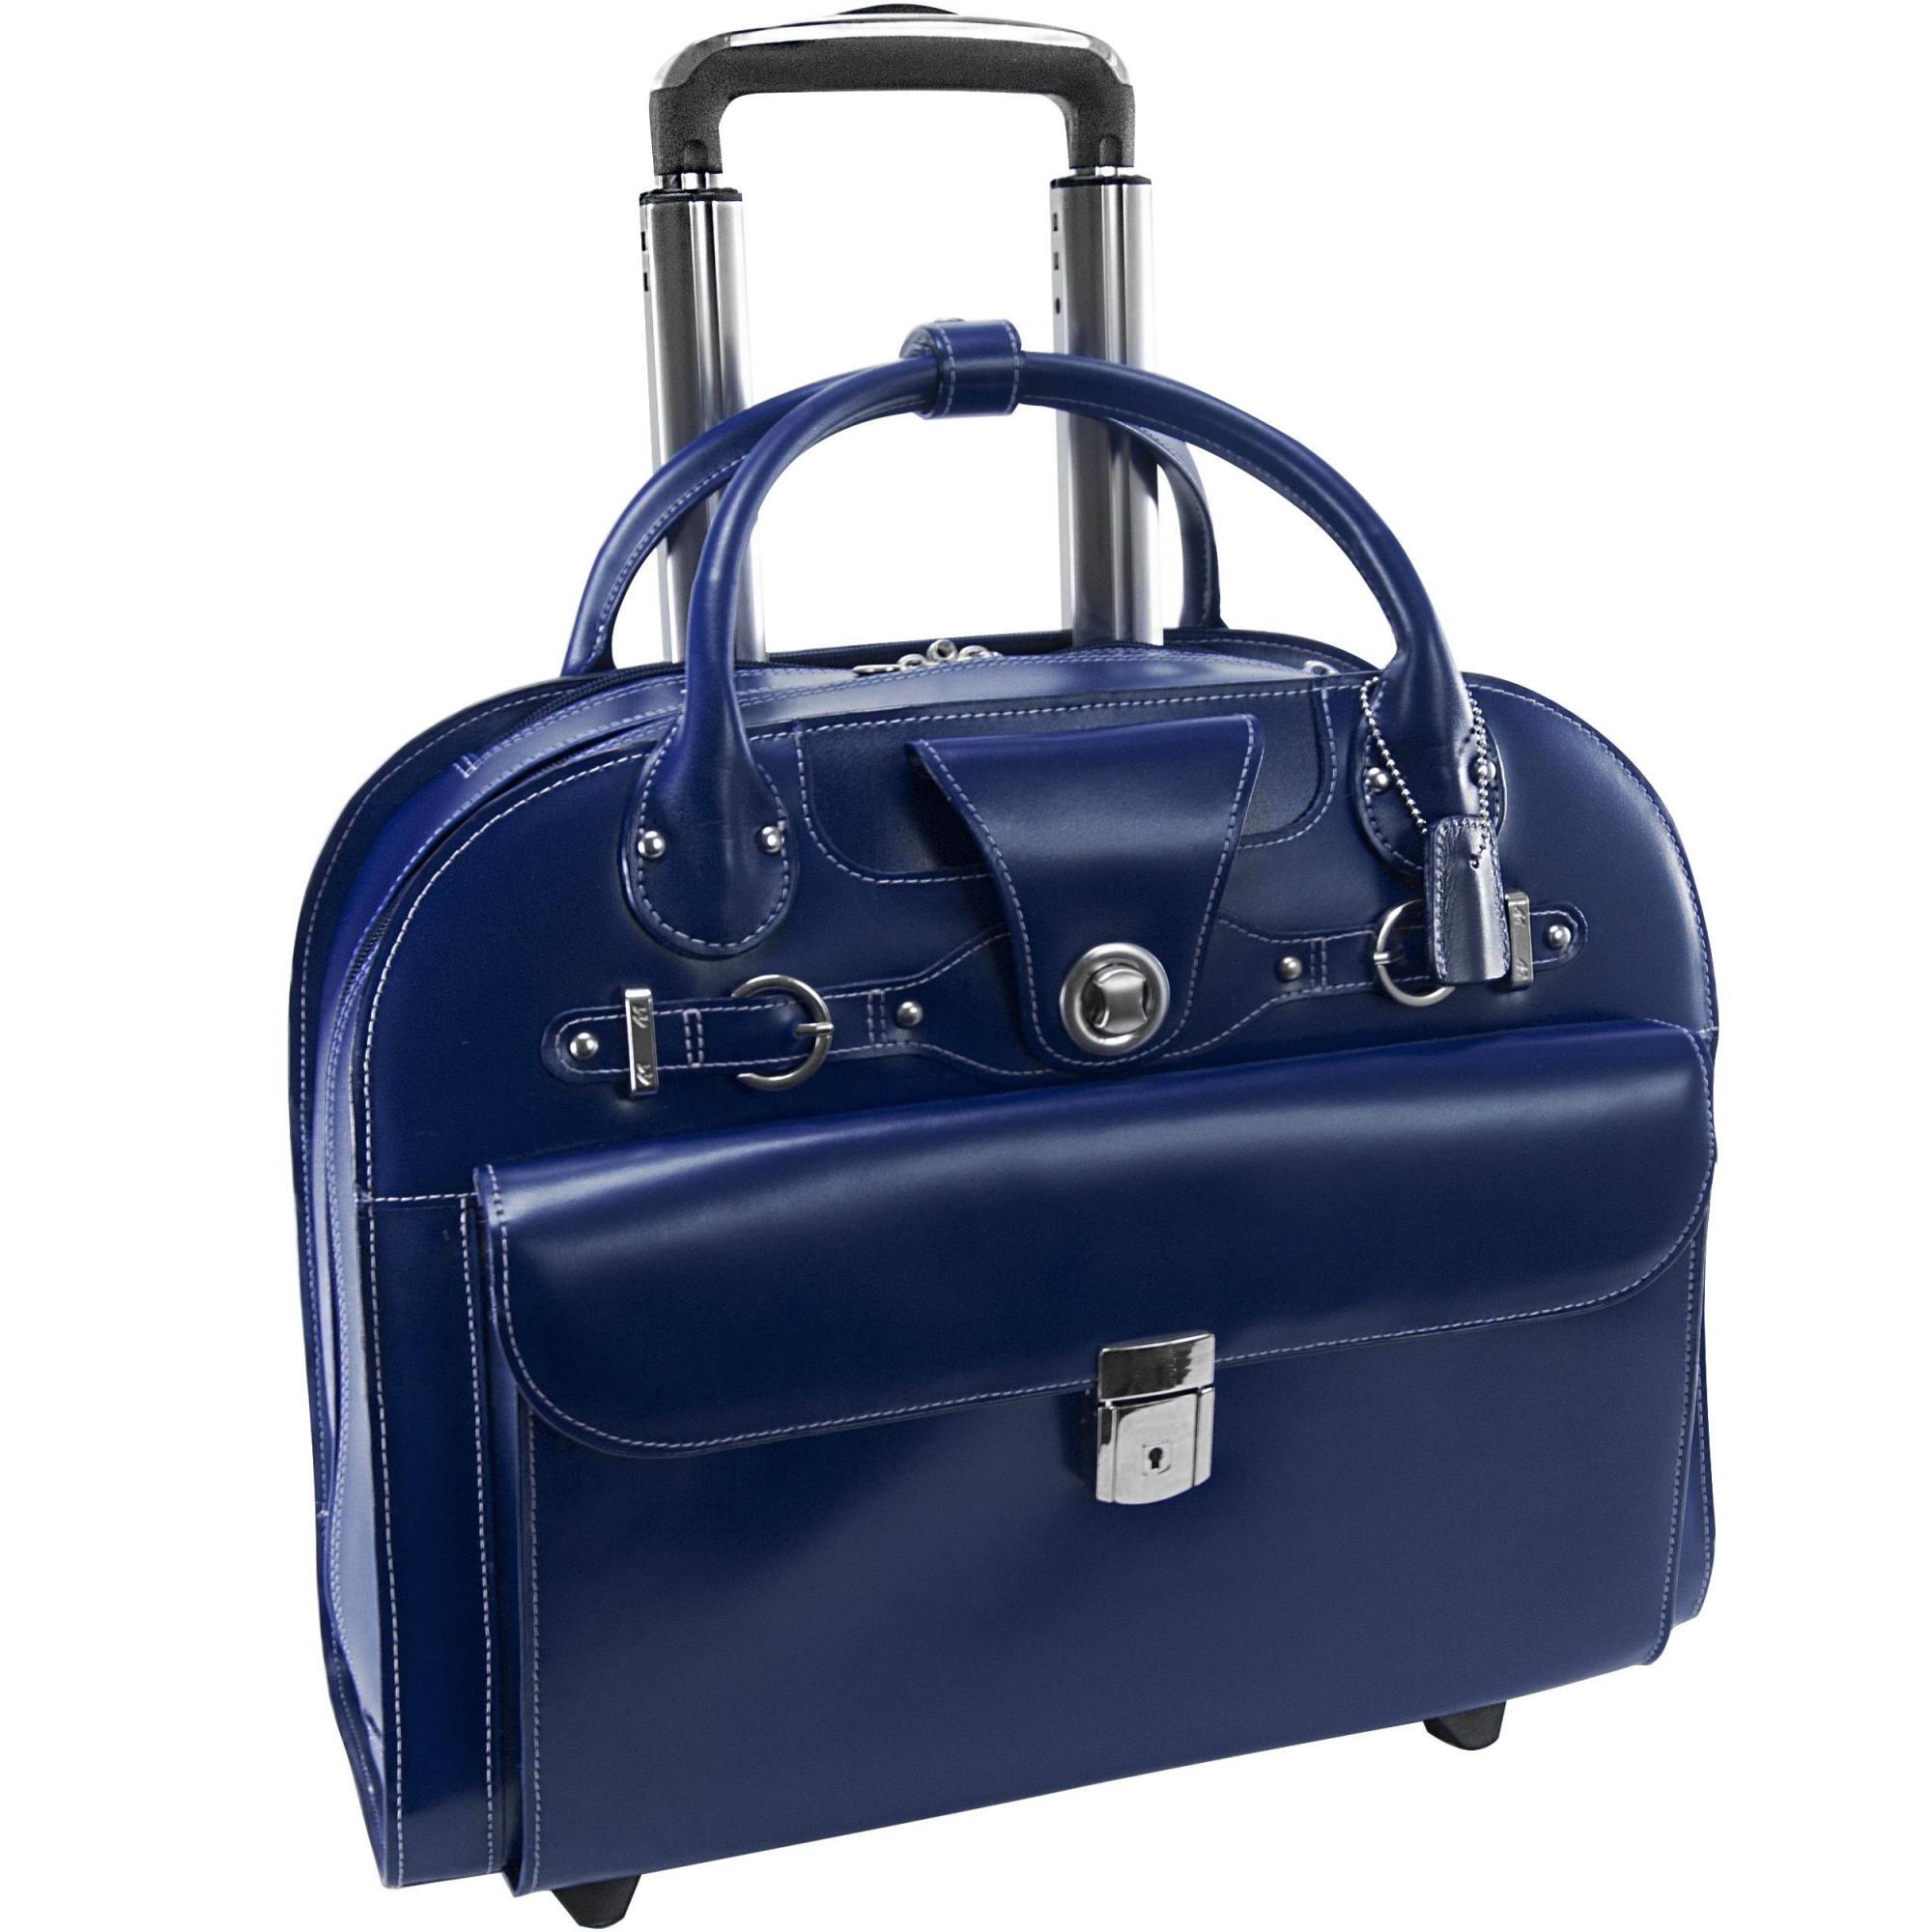 McKlein USA Edgebrook Navy 15.6'' Leather Wheeled Ladies' Laptop Case (96317)